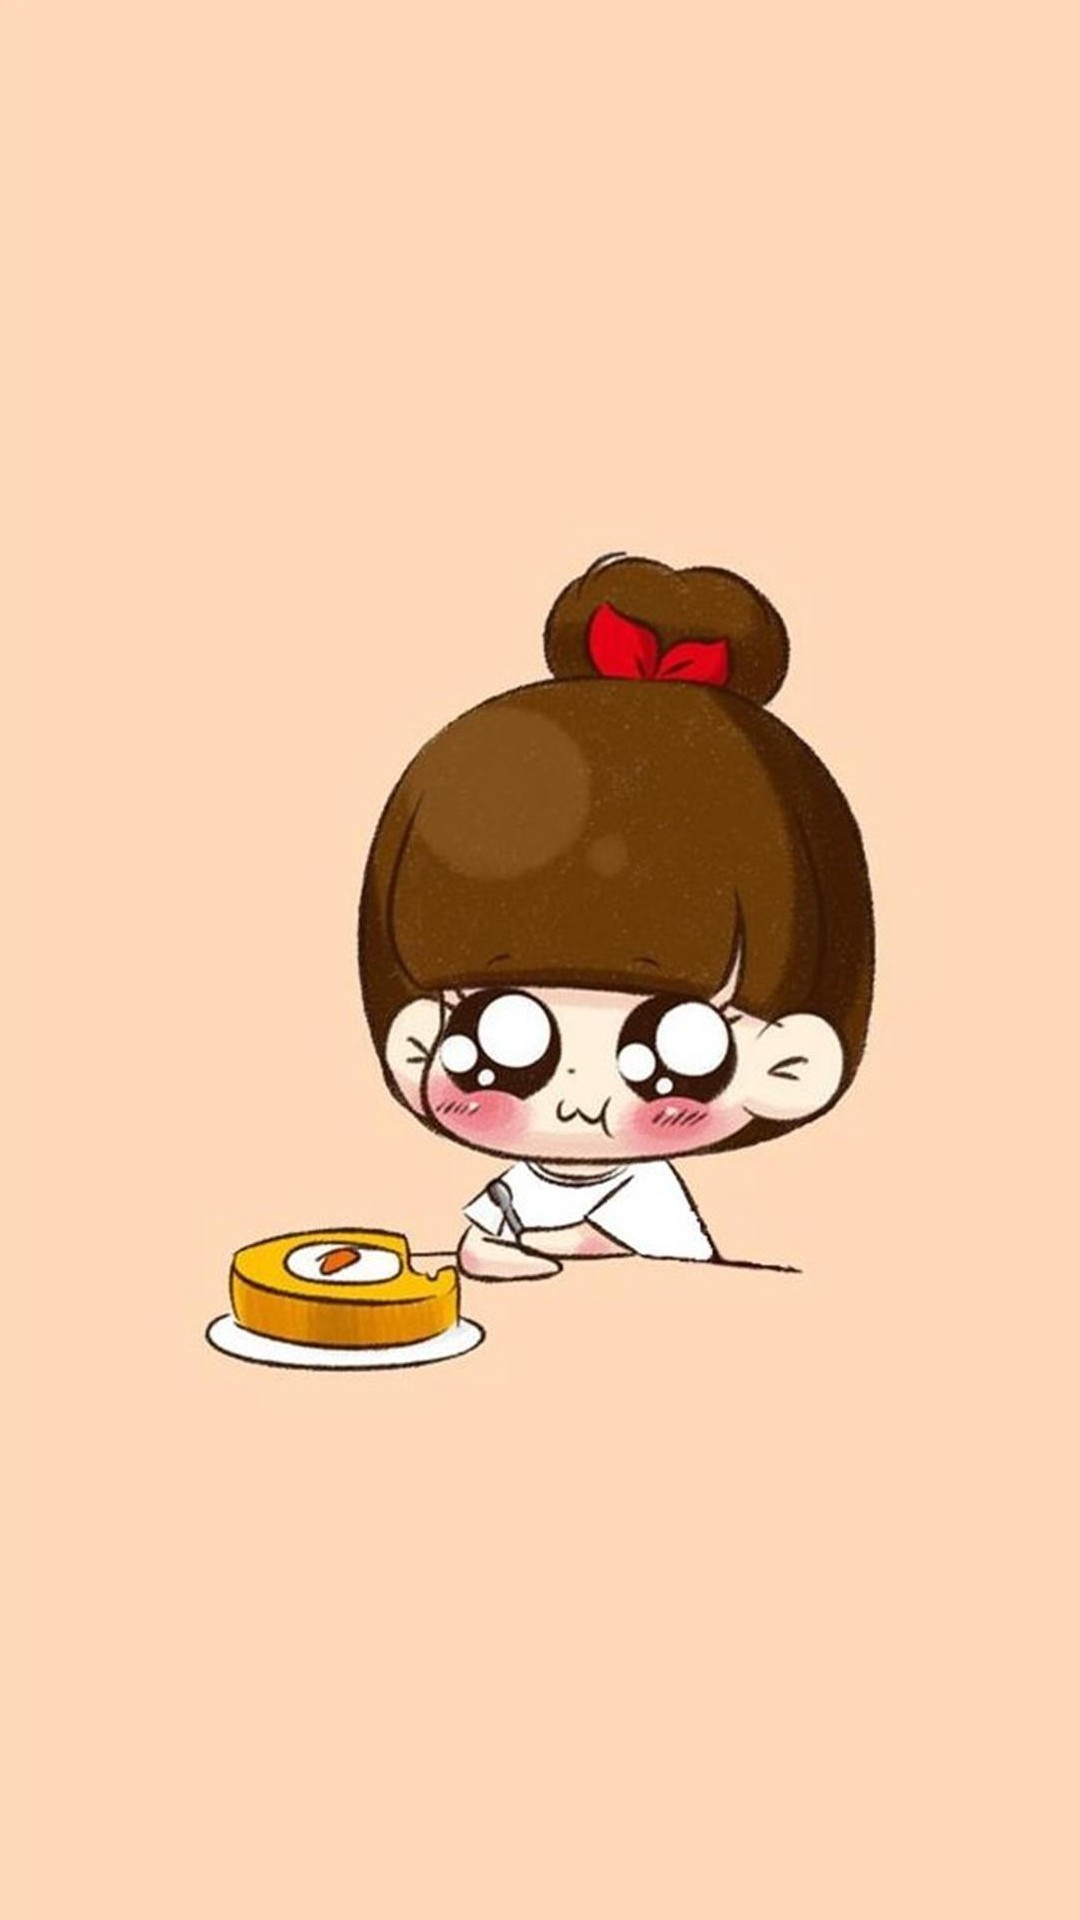 56 Cute Cartoon Food